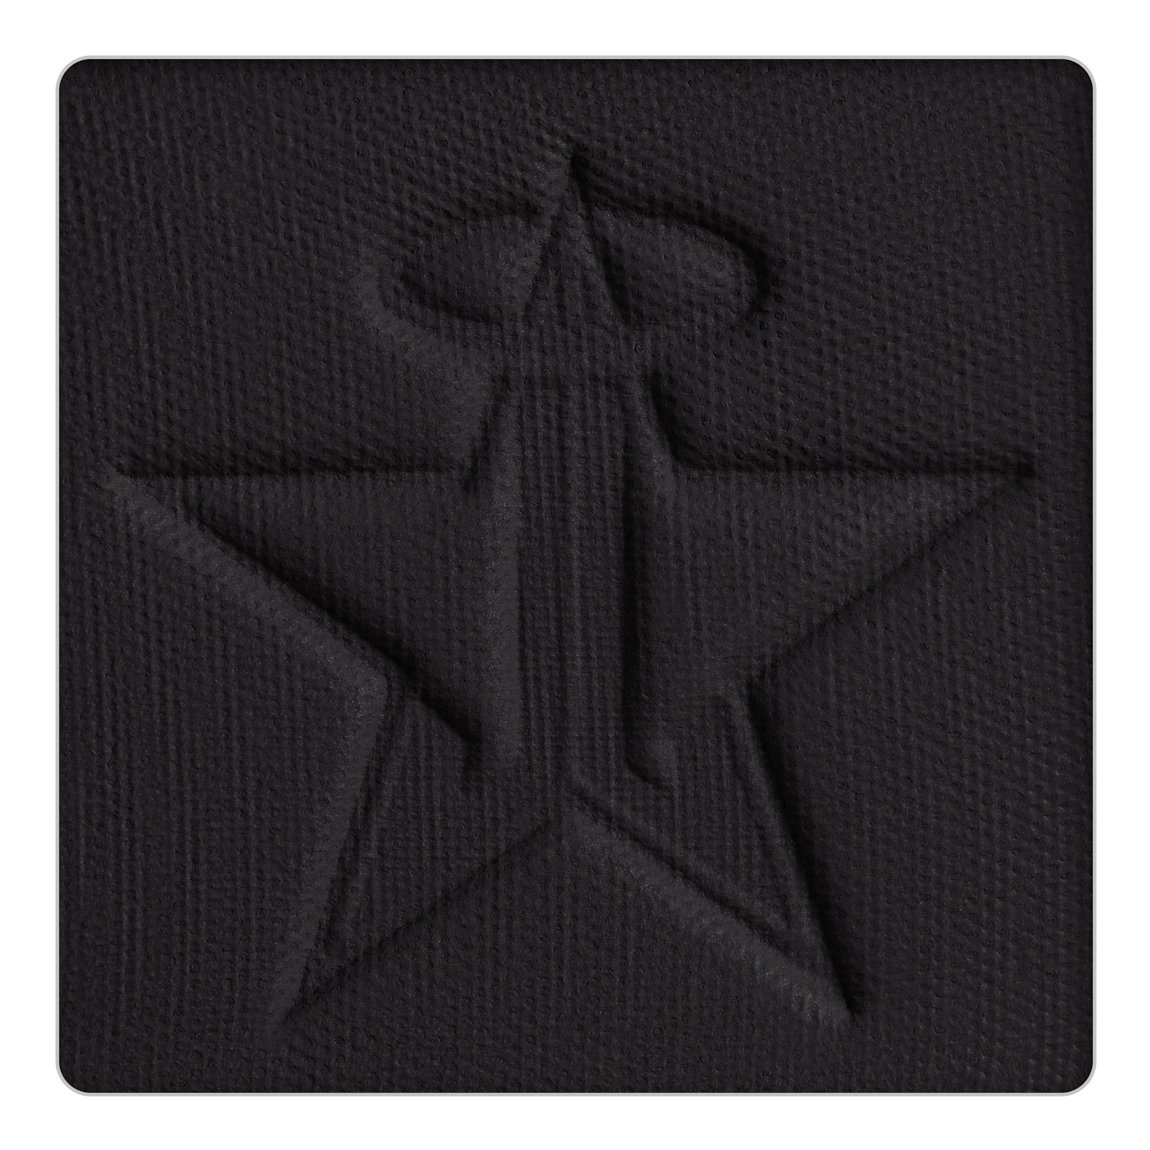 Jeffree Star Cosmetics Artistry Singles Hearse alternative view 1.